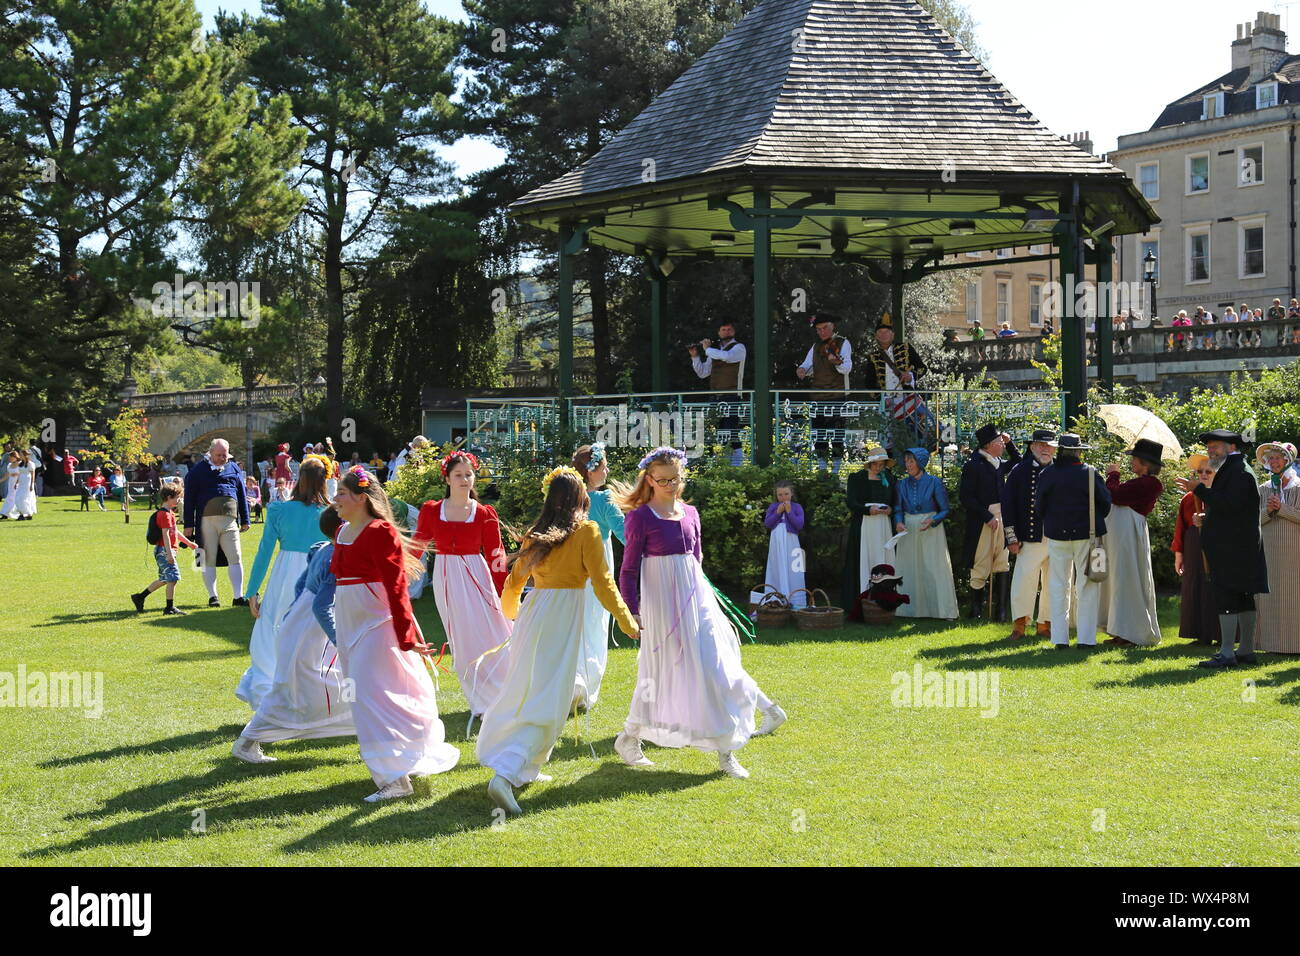 'Steps in Time' folk dance group entertain, Jane Austen Festival, Parade Gardens, Bath, Somerset, England, Great Britain, United Kingdom UK, Europe Stock Photo